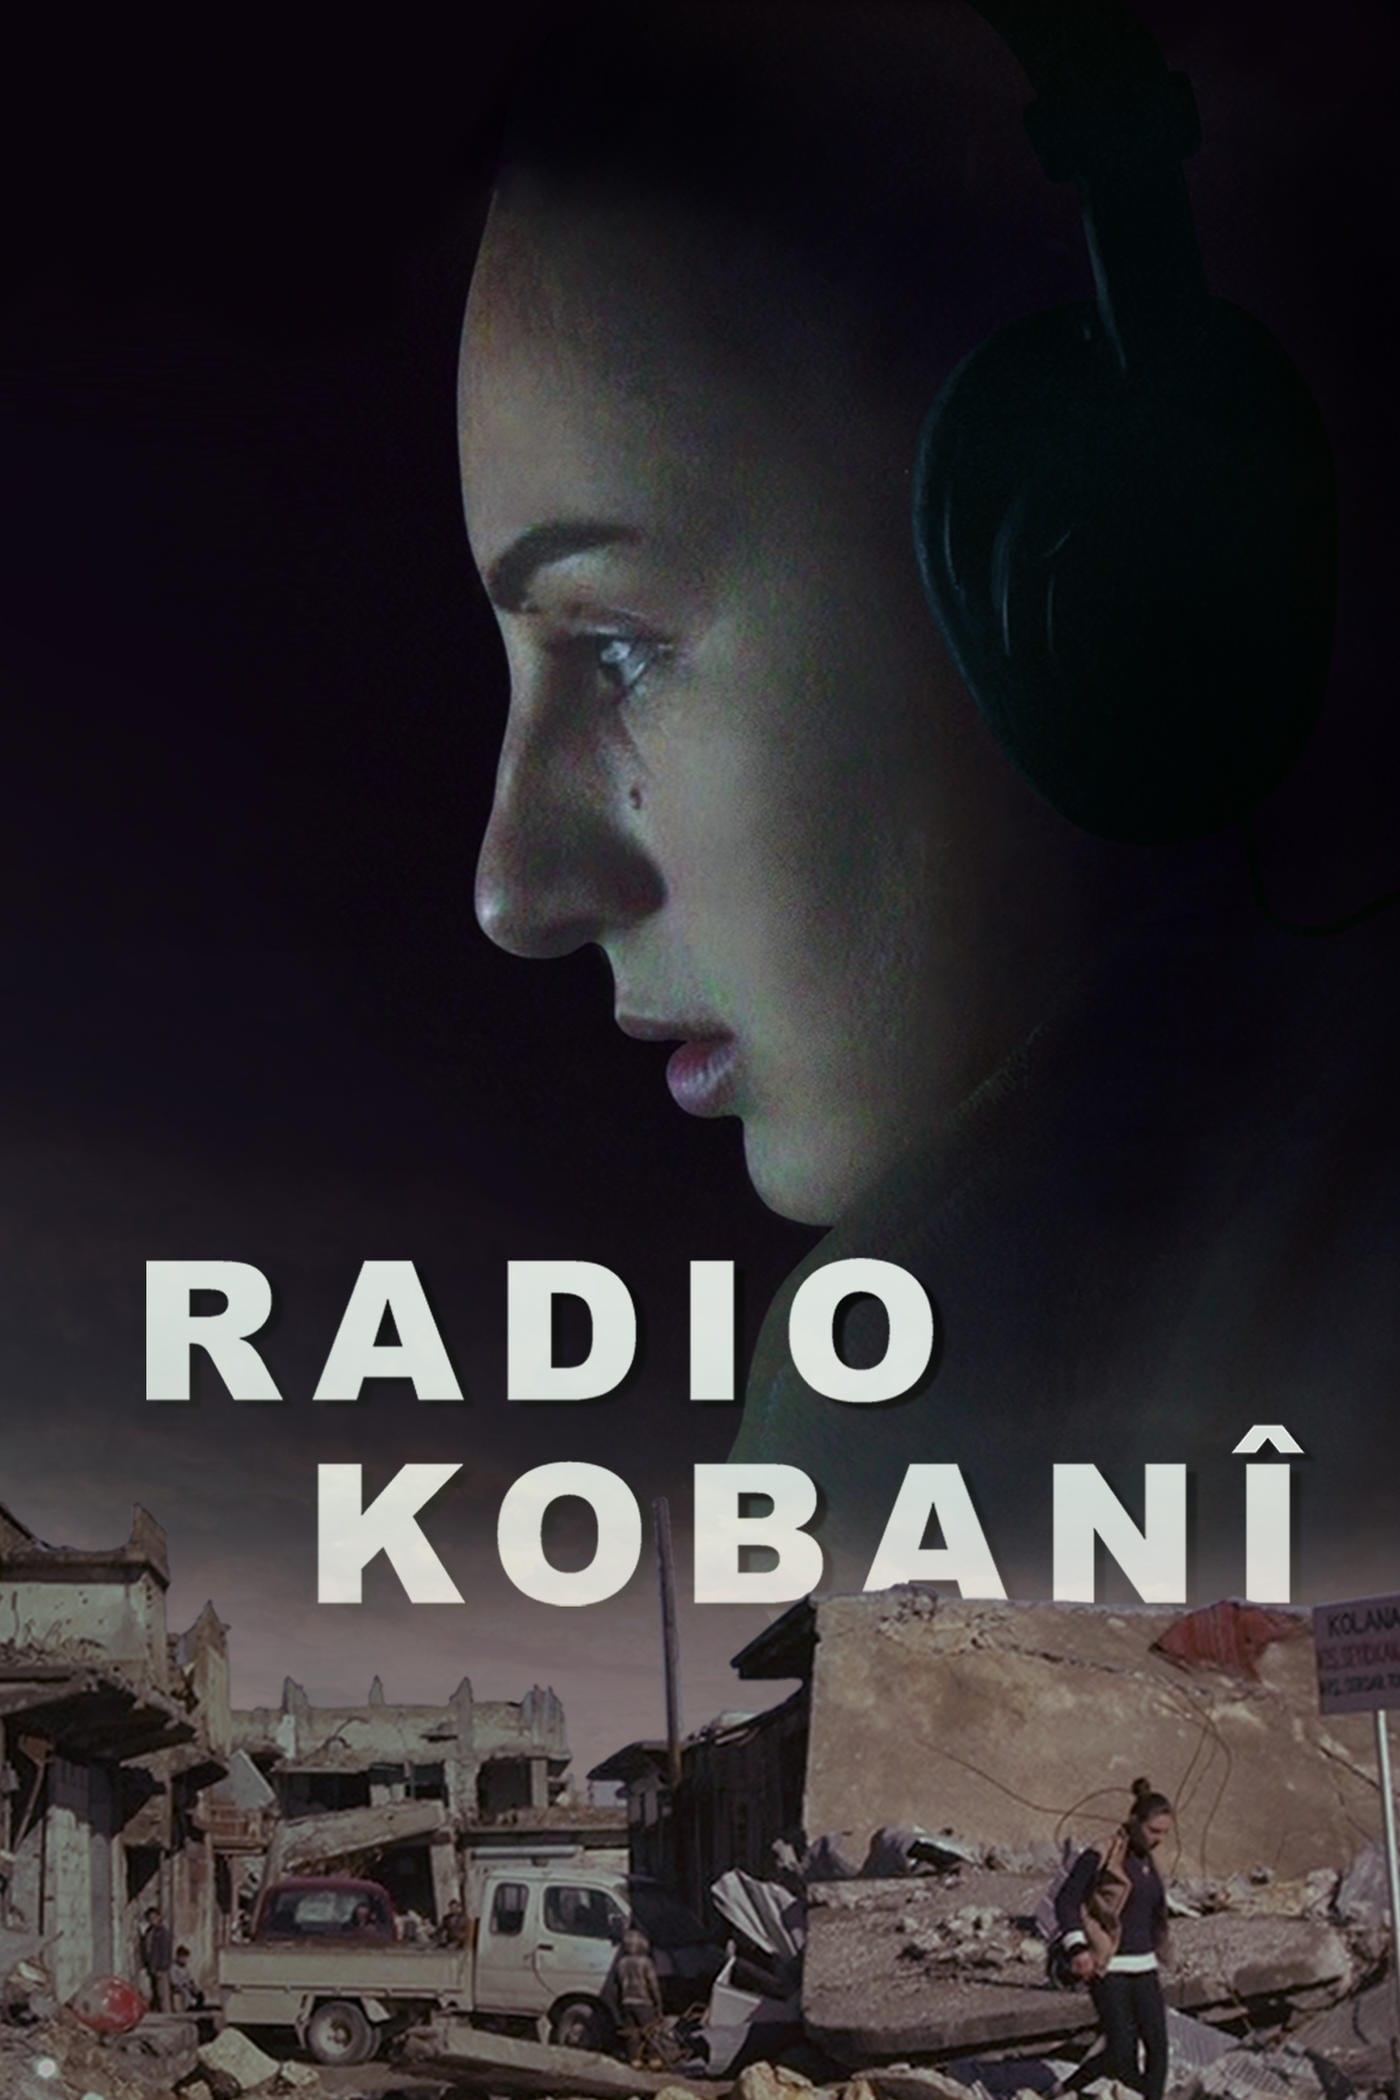 Radio Kobanî